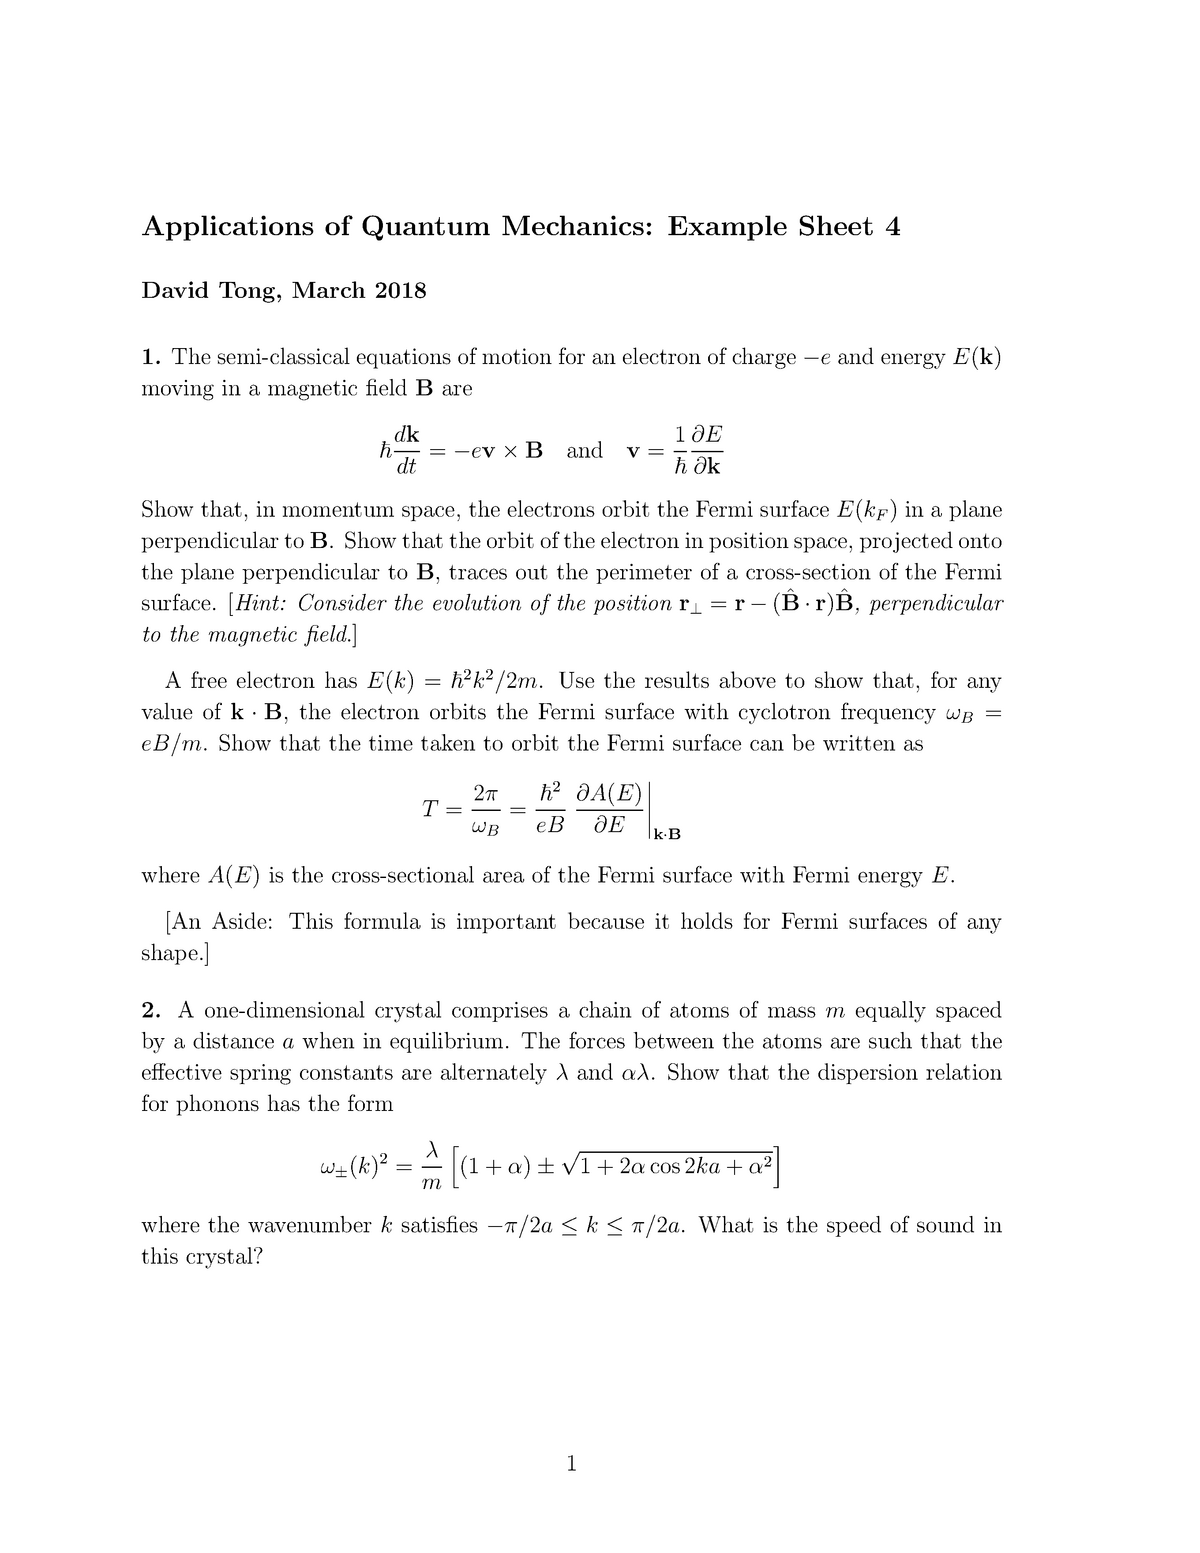 Applications of Quantum Mechanics Example Sheet 4 - D19